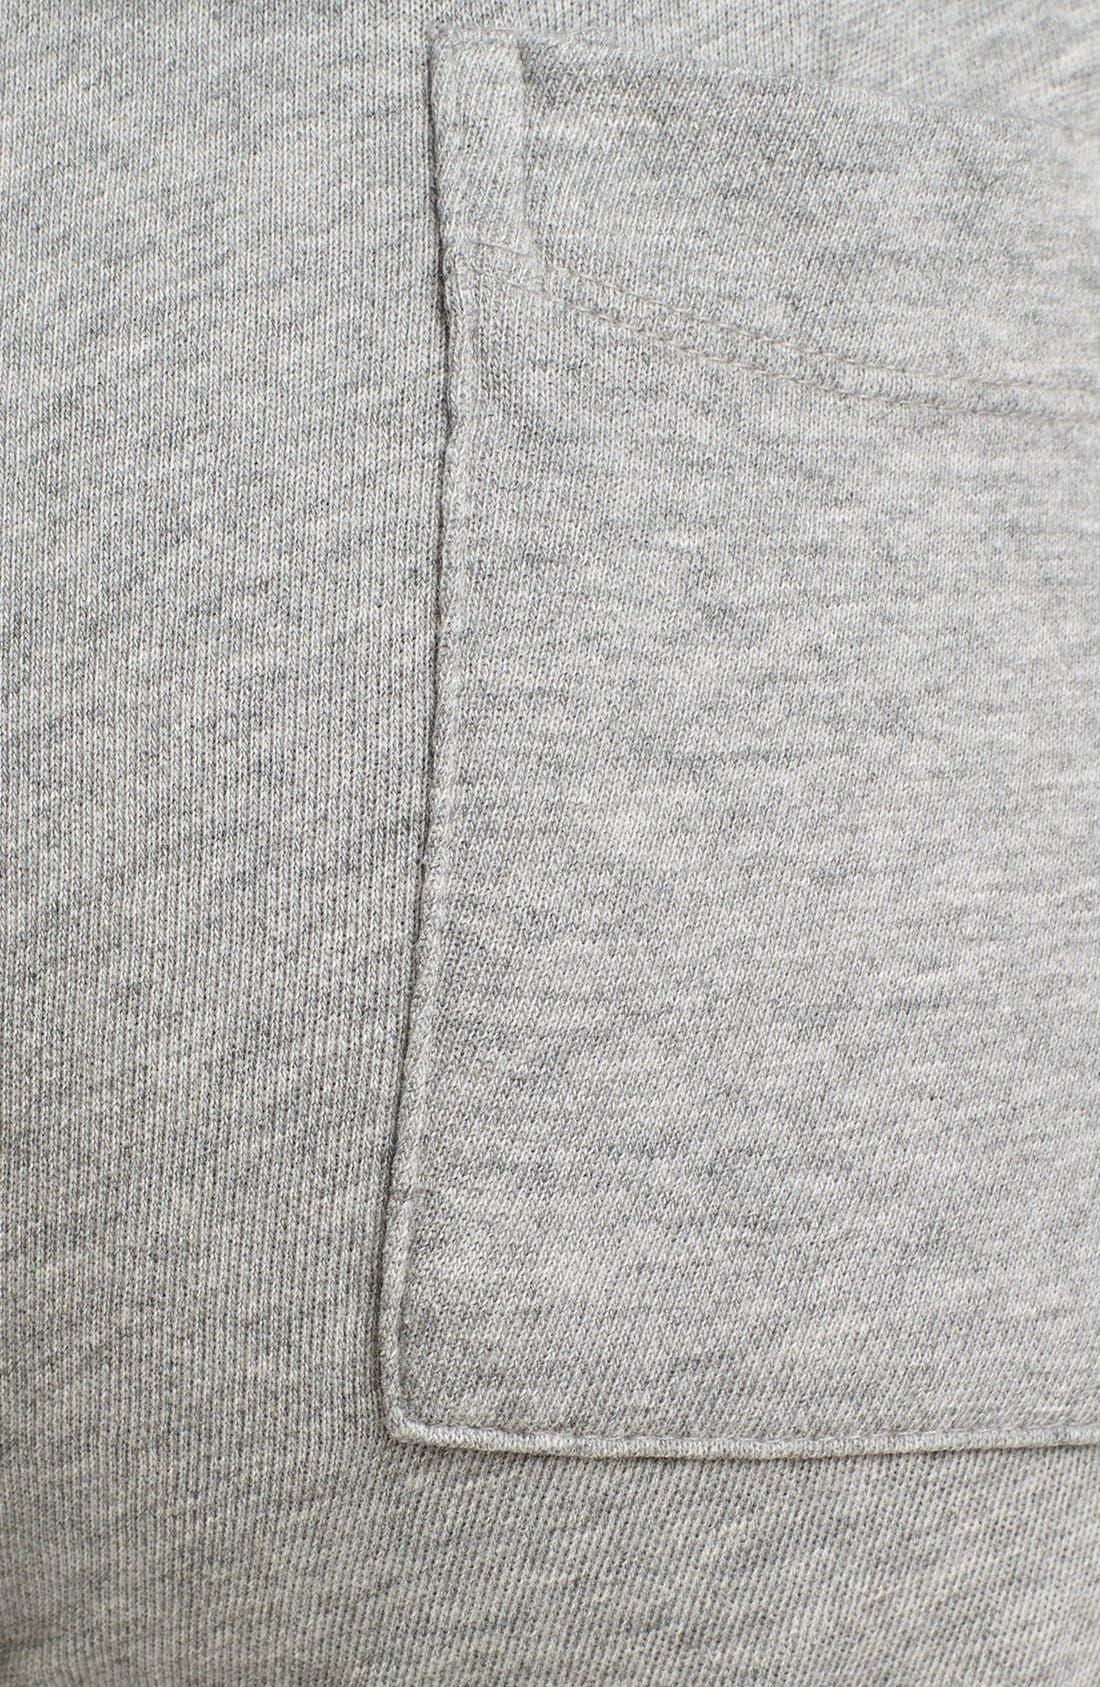 Classic Sweatpants,                             Alternate thumbnail 5, color,                             086